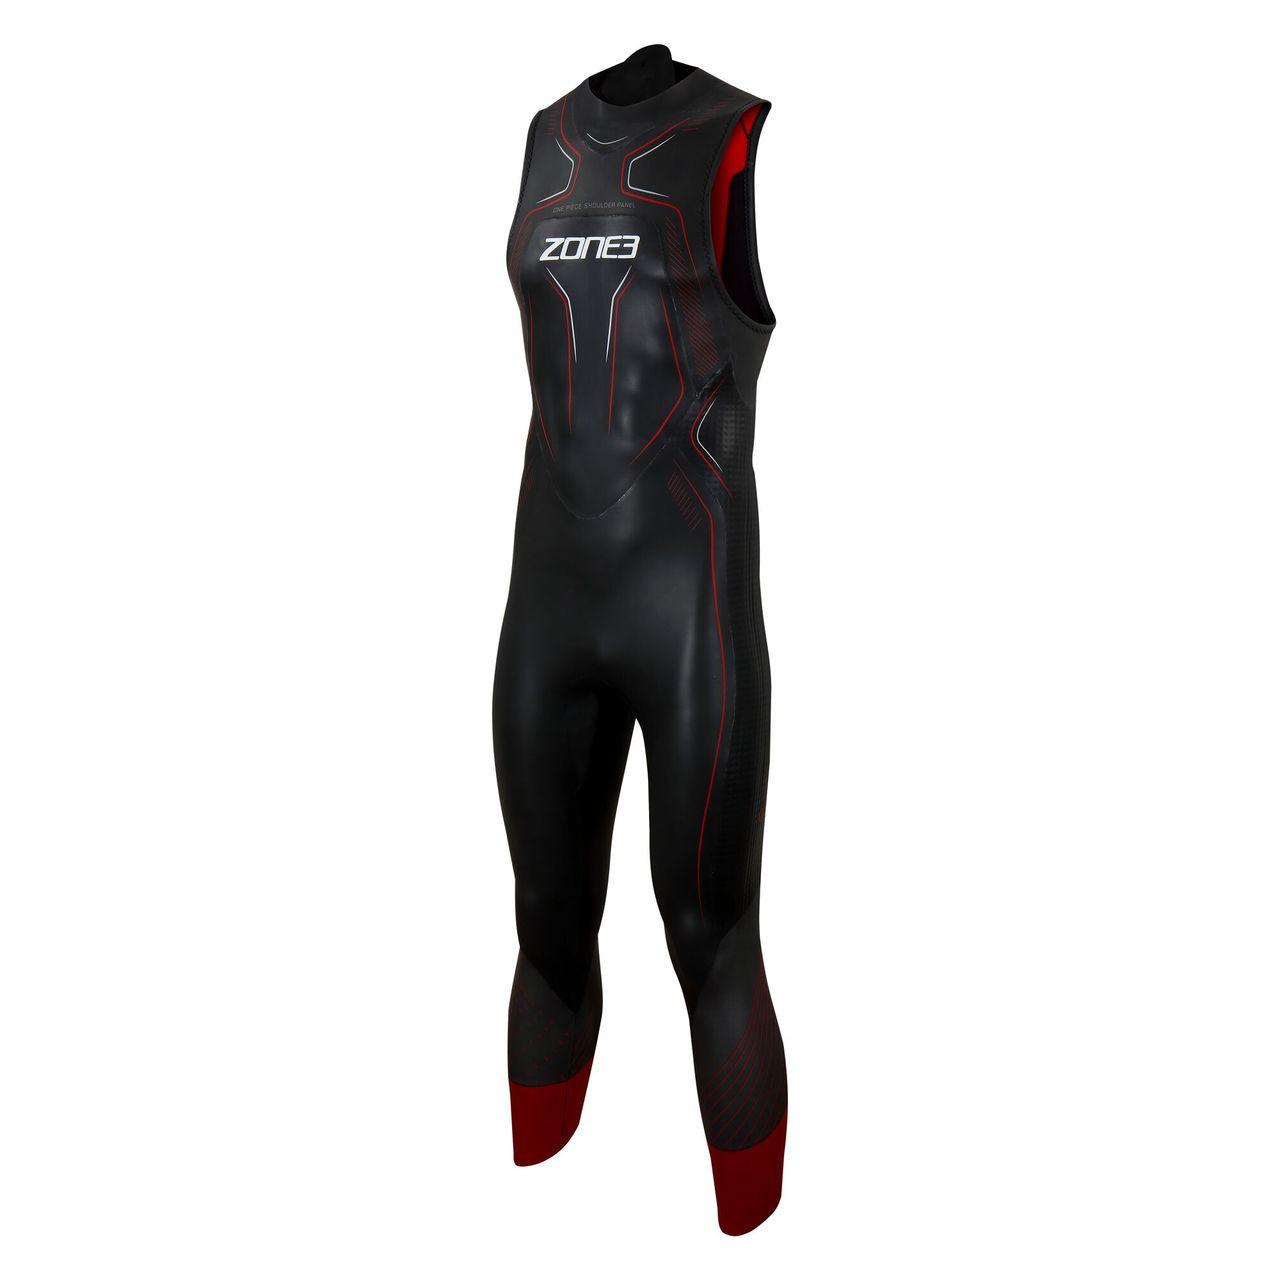 Zone3 Men's Aspire Sleeveless Wetsuit - 2019 price